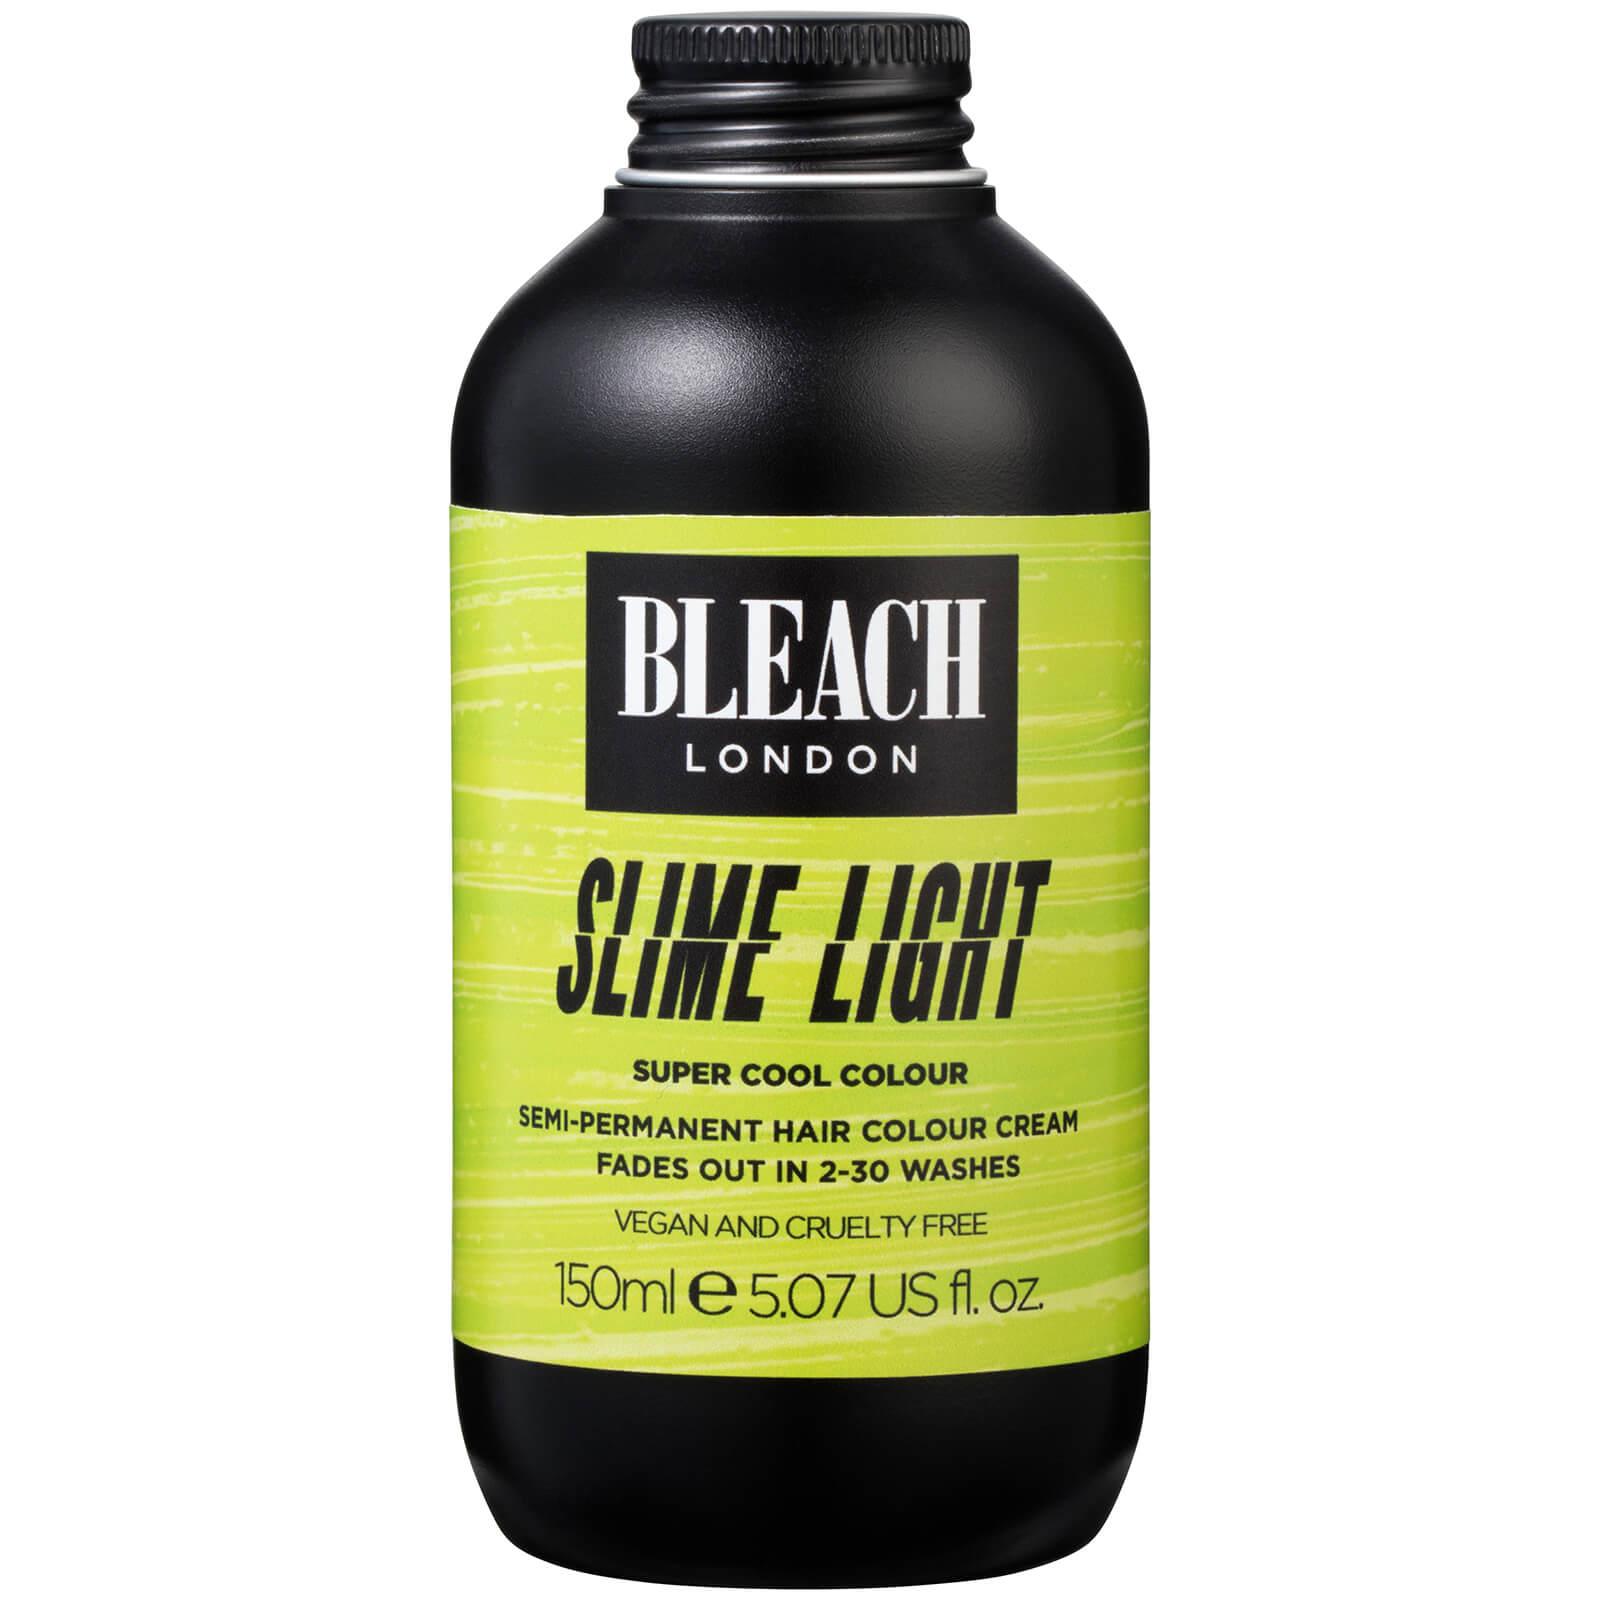 BLEACH LONDON Slime Light Super Cool Colour 150ml